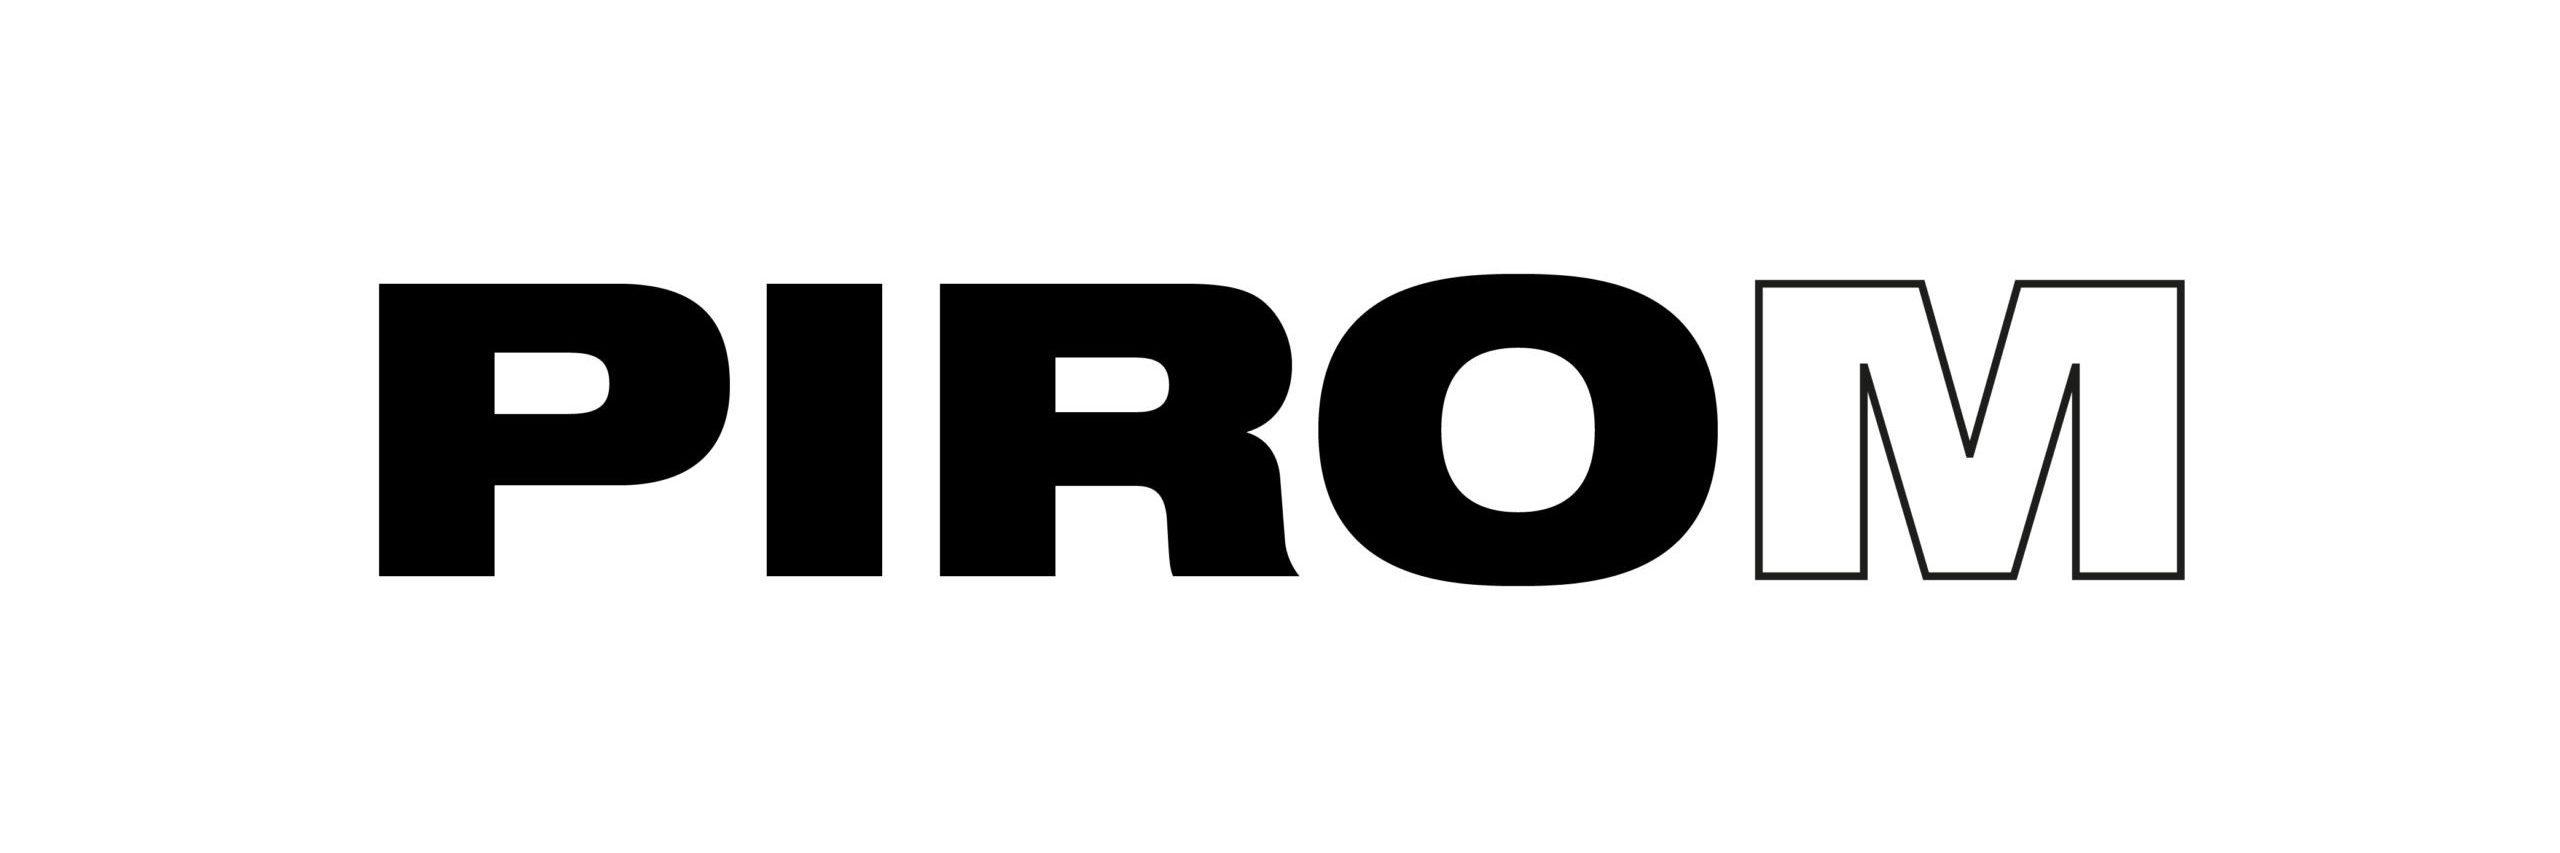 PIRO Media